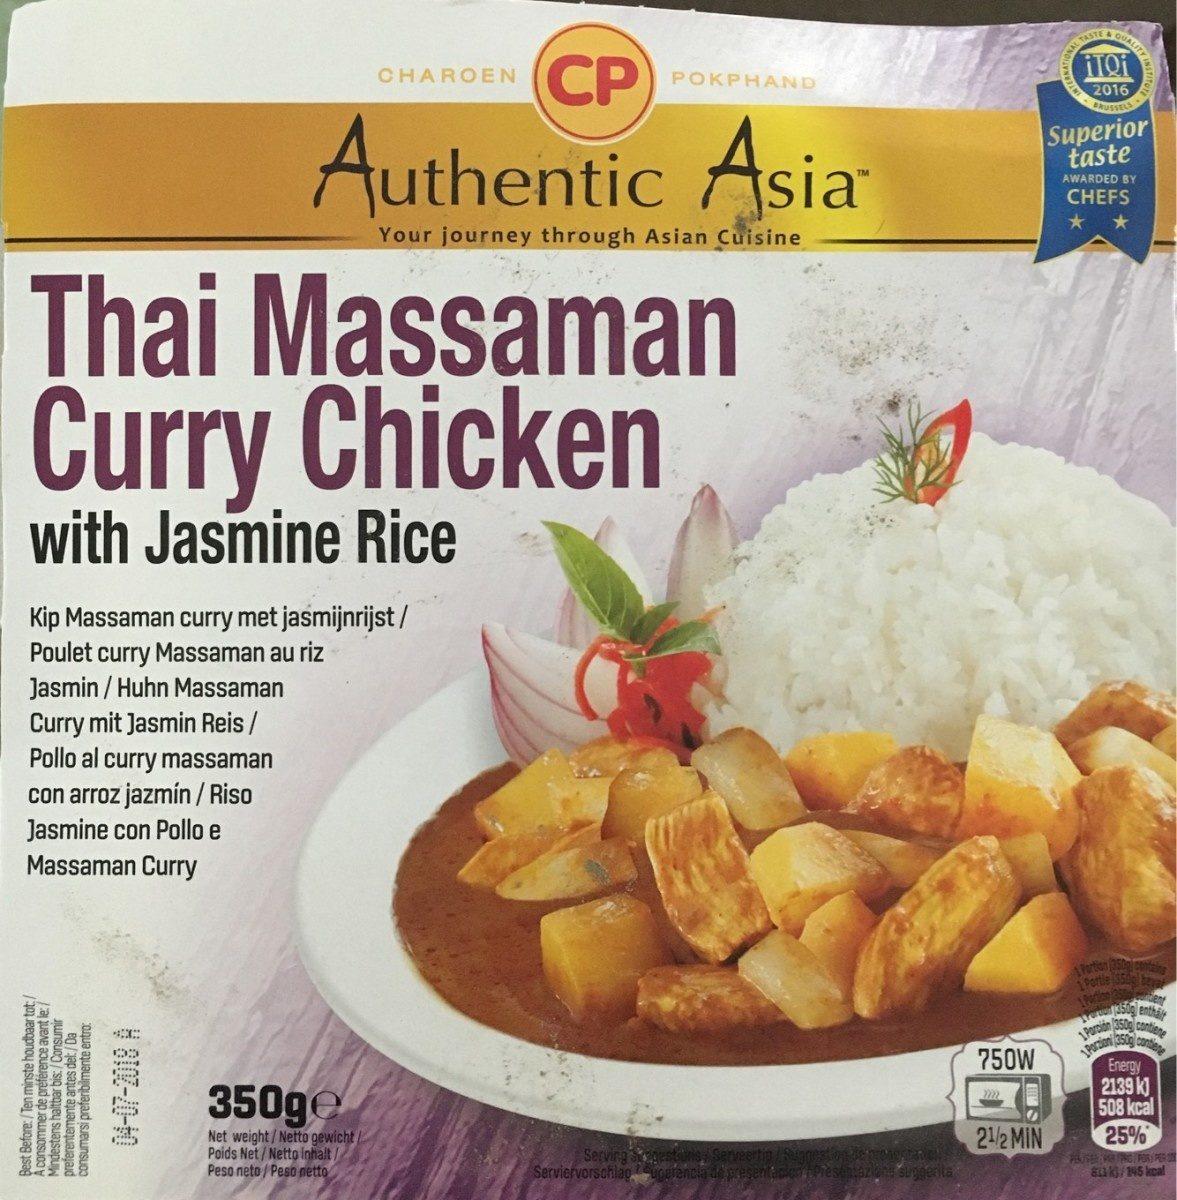 Thai Masaaman Curey Chicken - Product